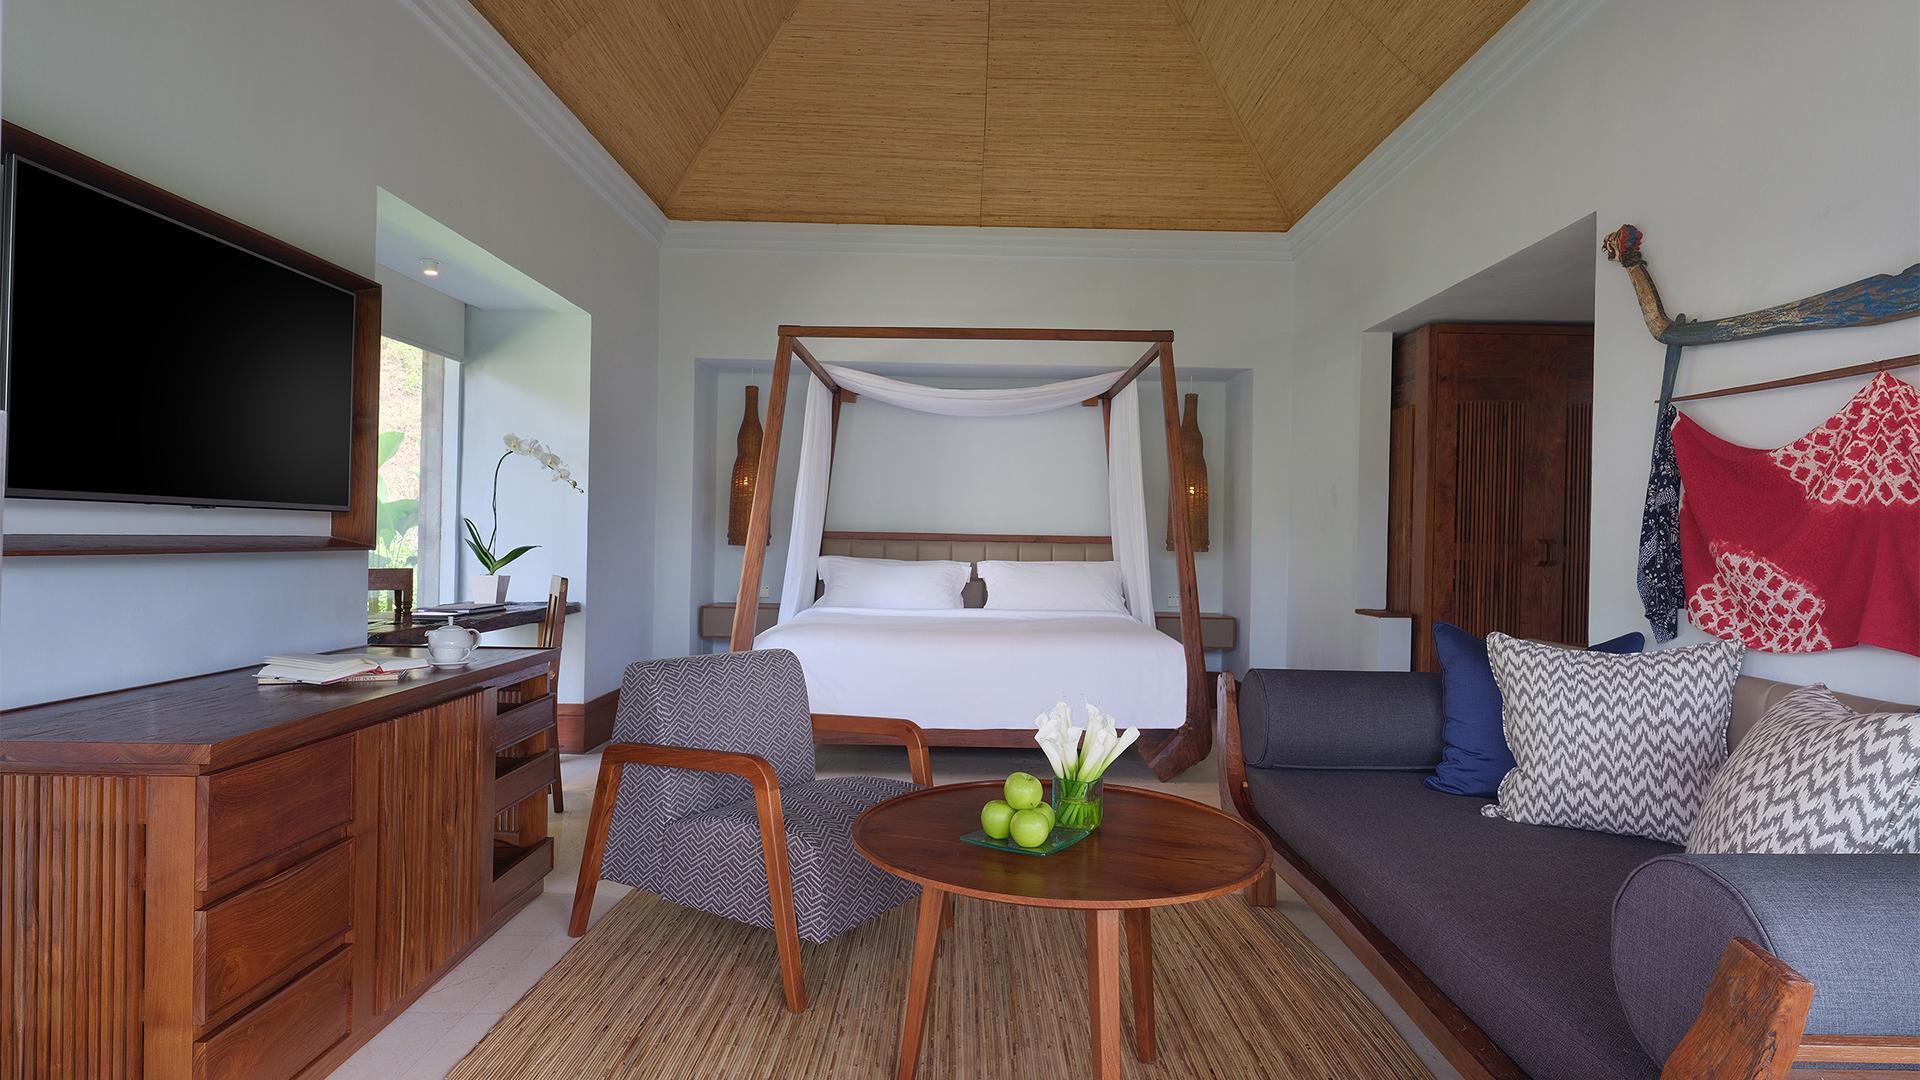 Heavenly Jacuzzi Villa image 1 at Maya Ubud Resort & Spa by Kabupaten Gianyar, Bali, Indonesia